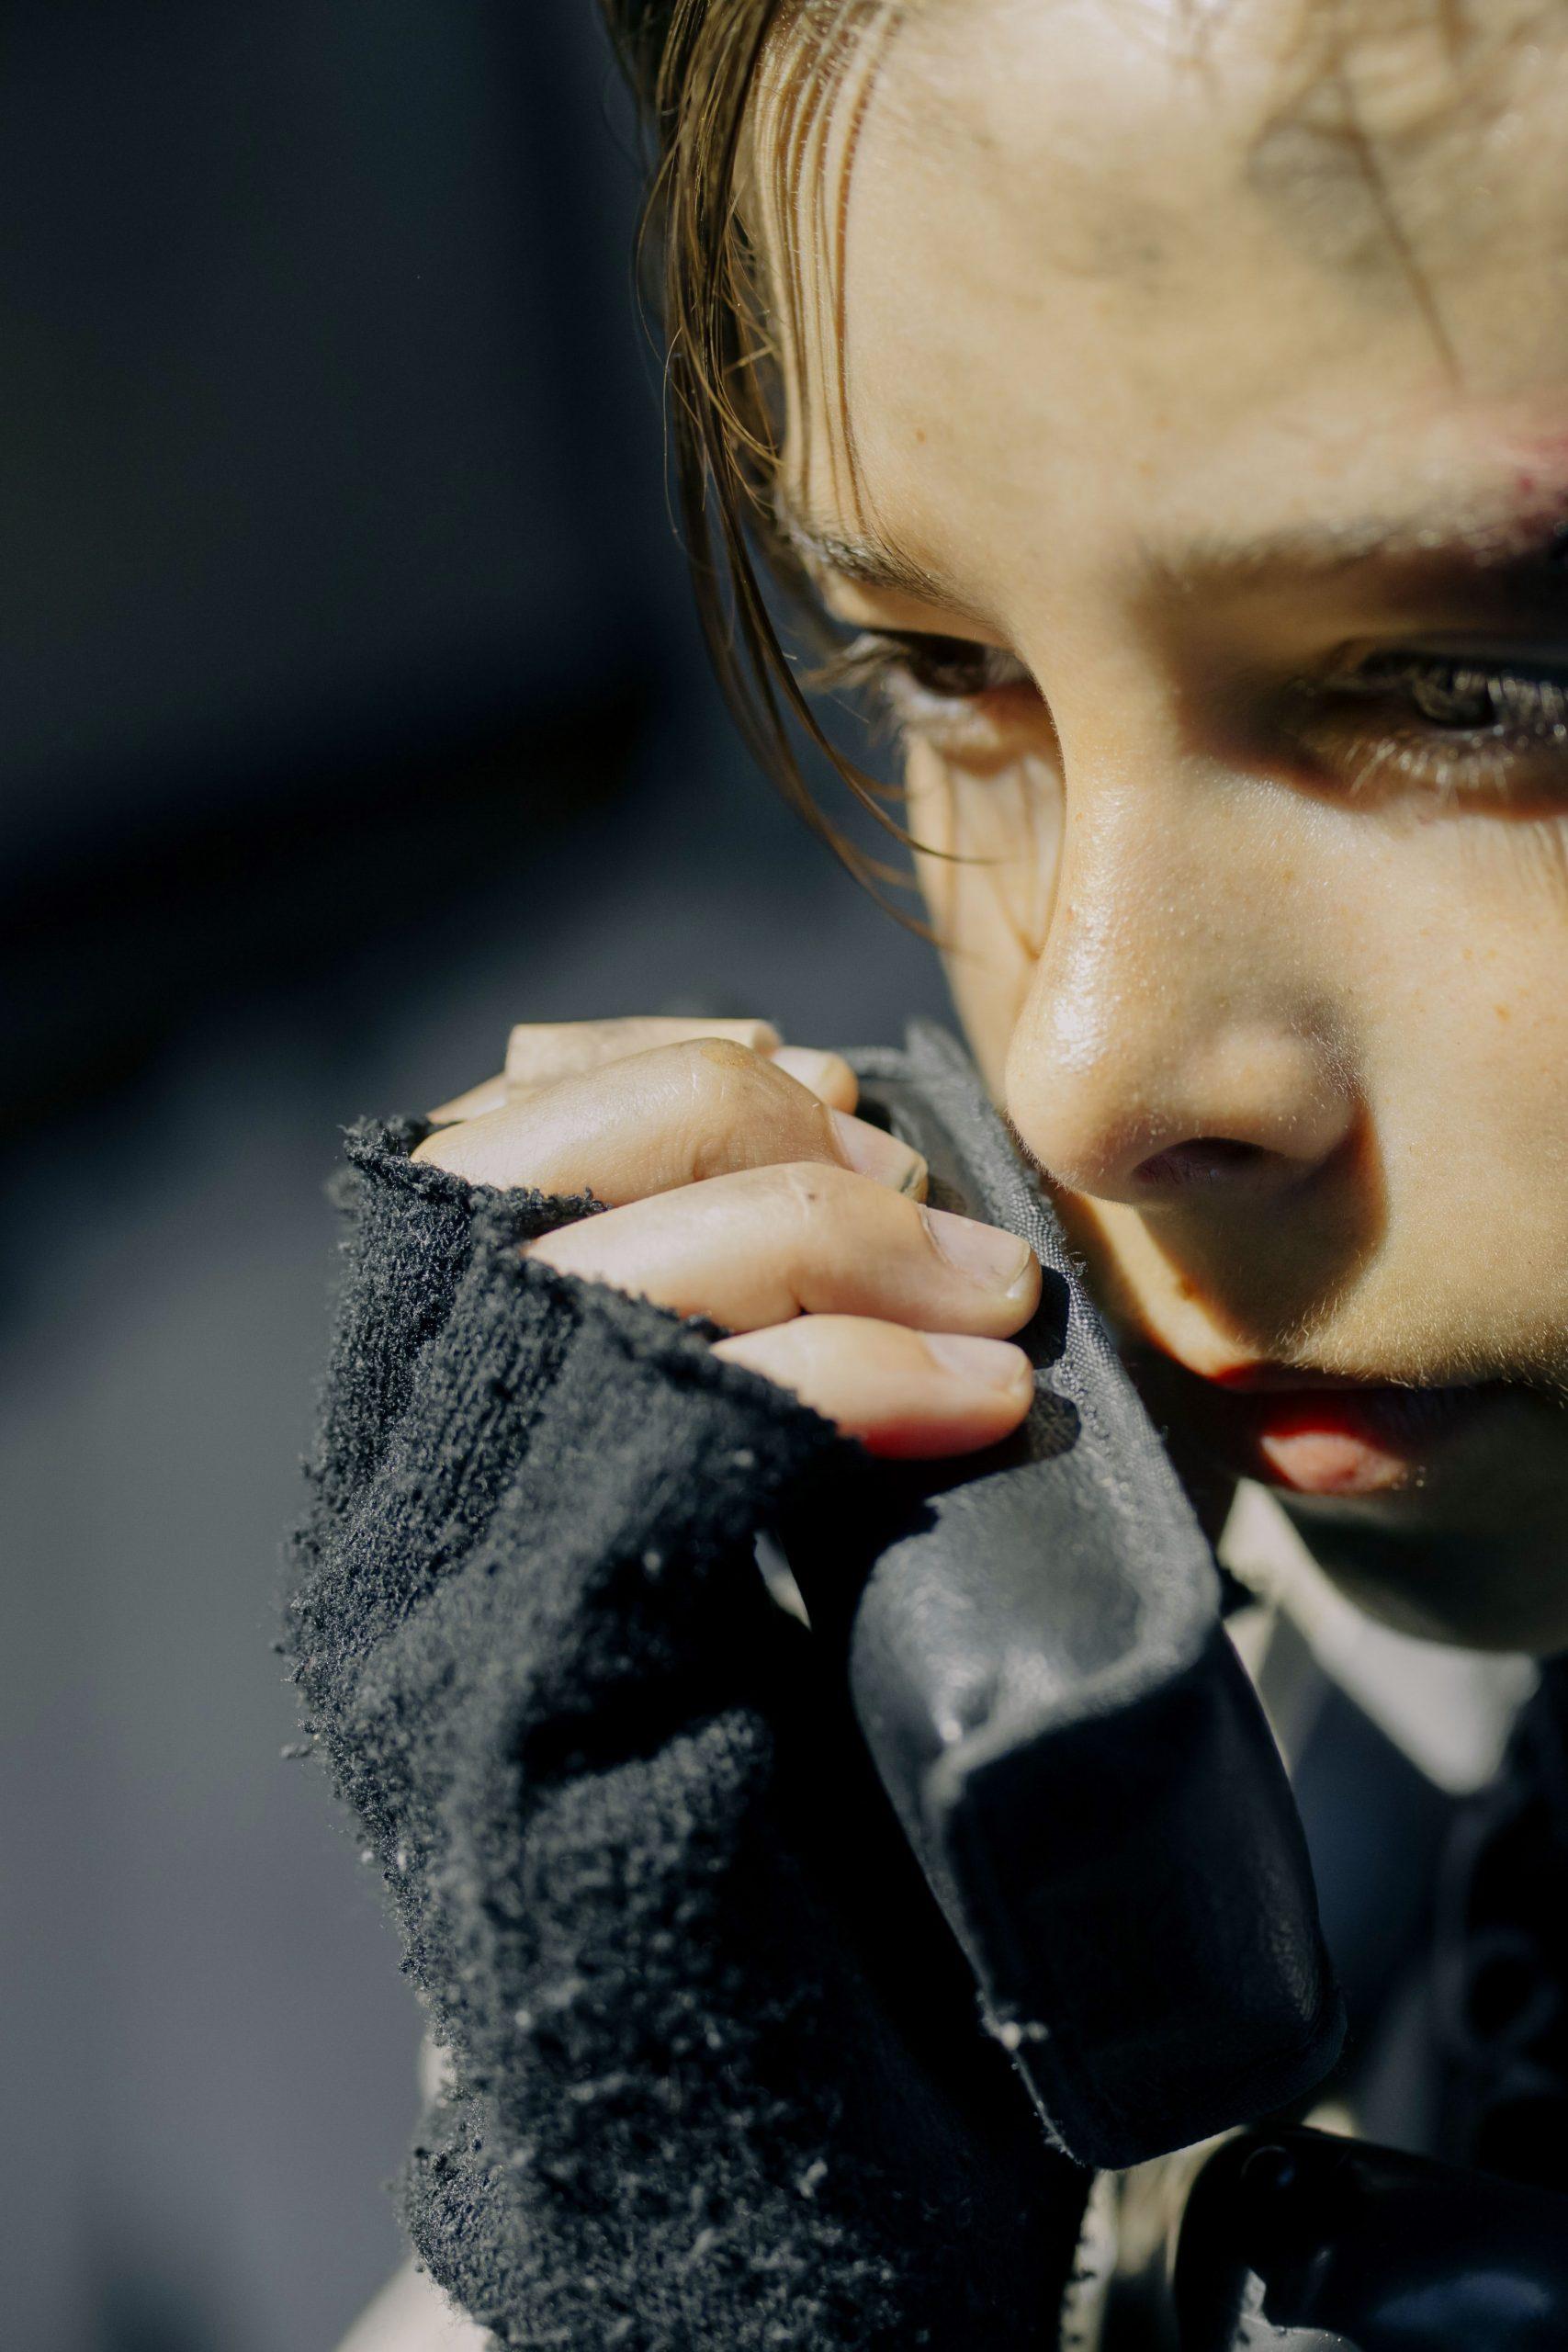 Sad Boy Dp Images photo for download